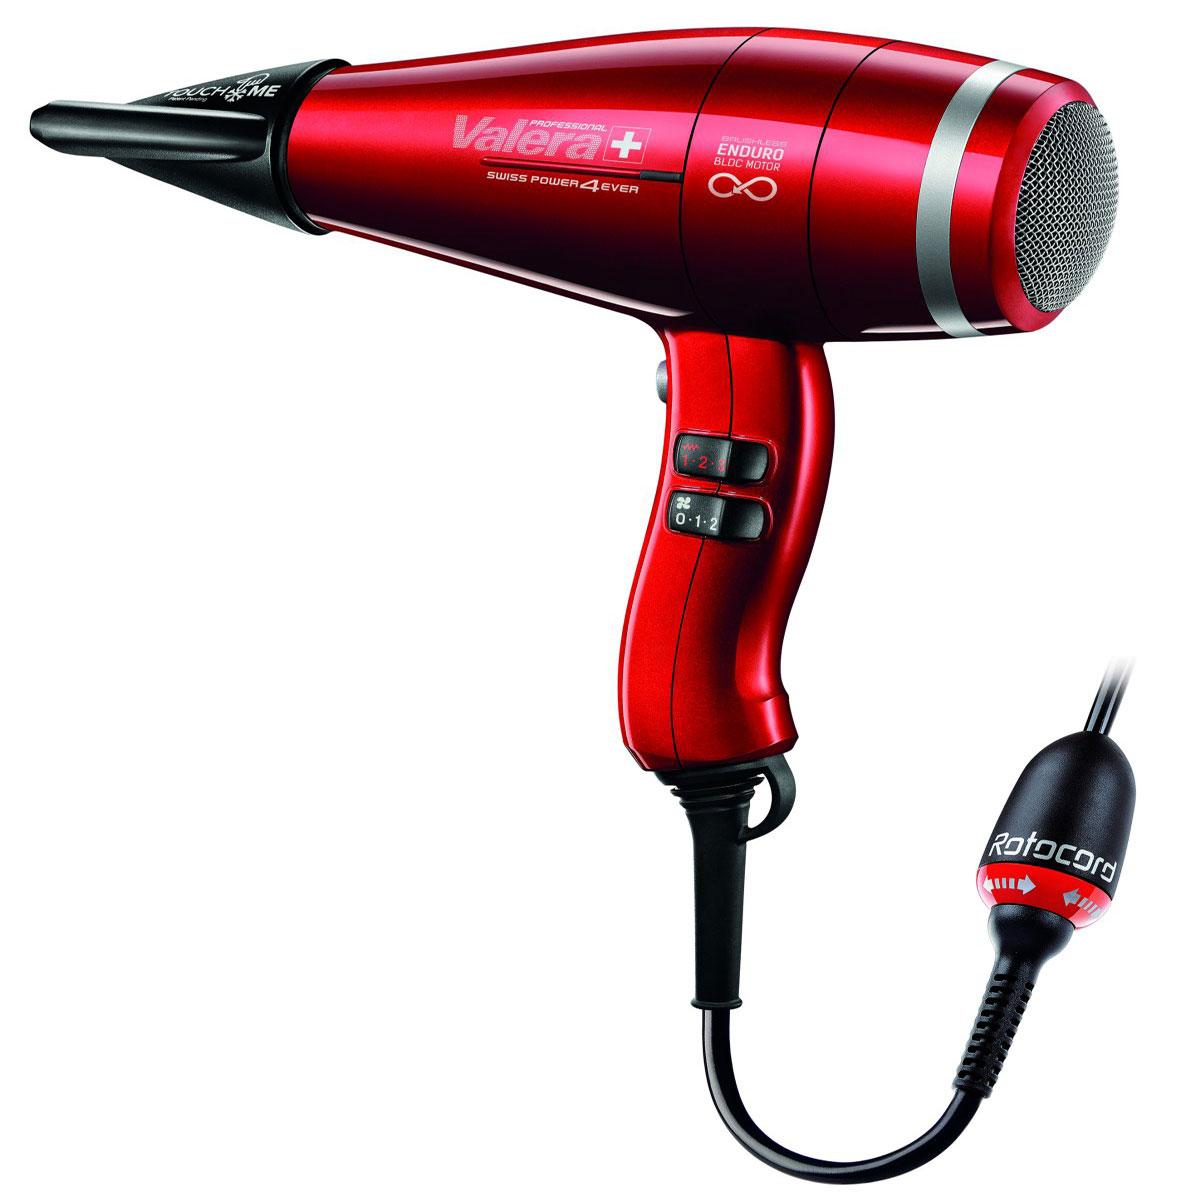 Valera SP4 D RC Swiss Power4ever, Red профессиональный фен - Фены